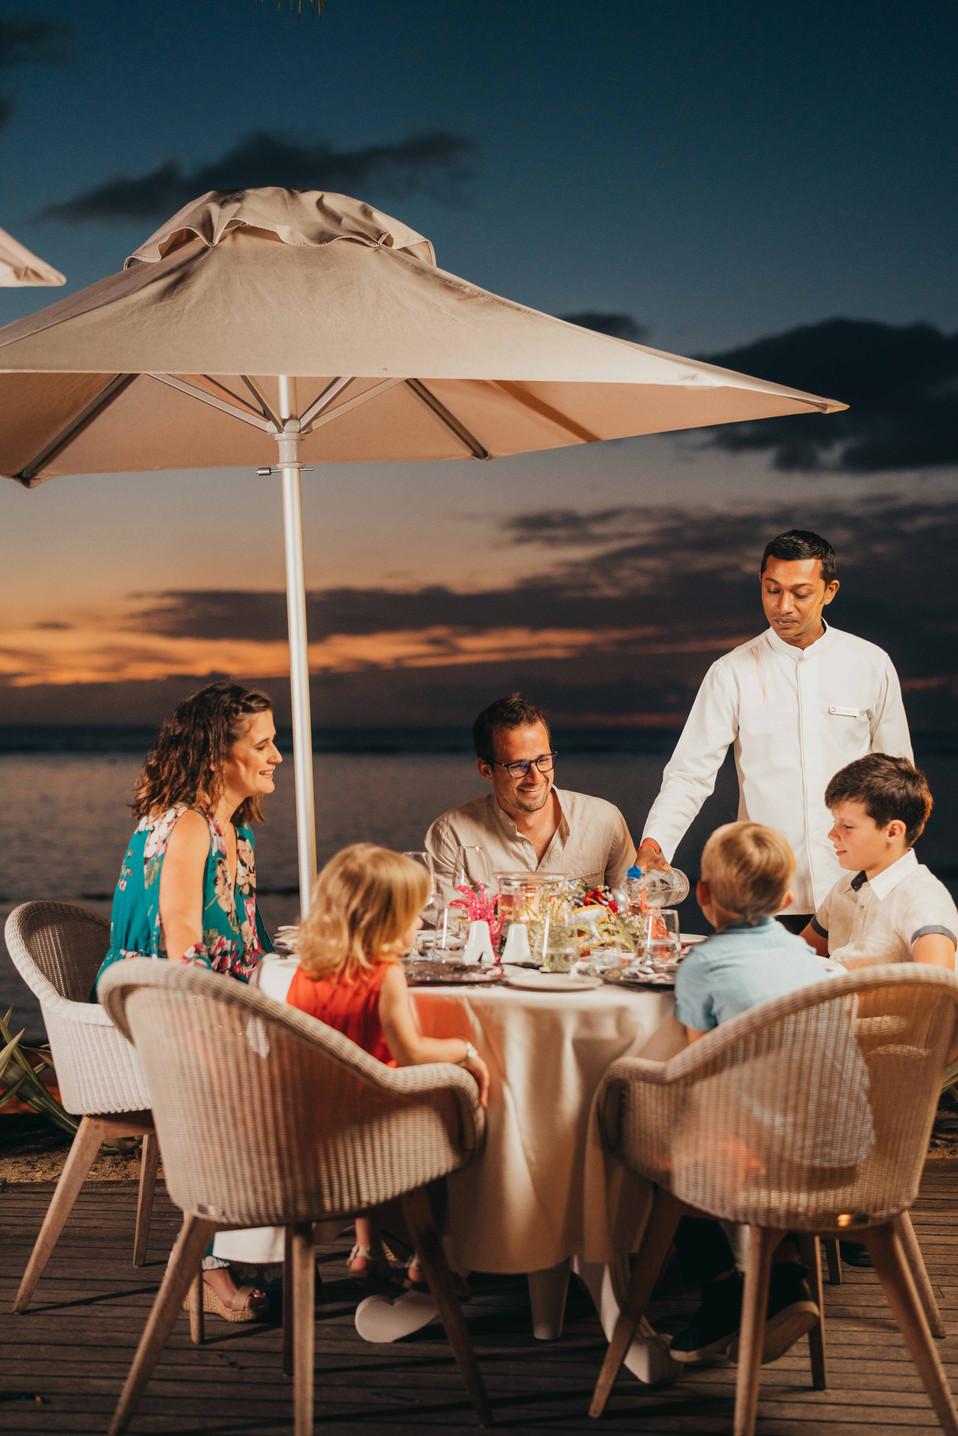 DSC09178.jpgBeachcomber Resorts & Hotels - Corporate Photography